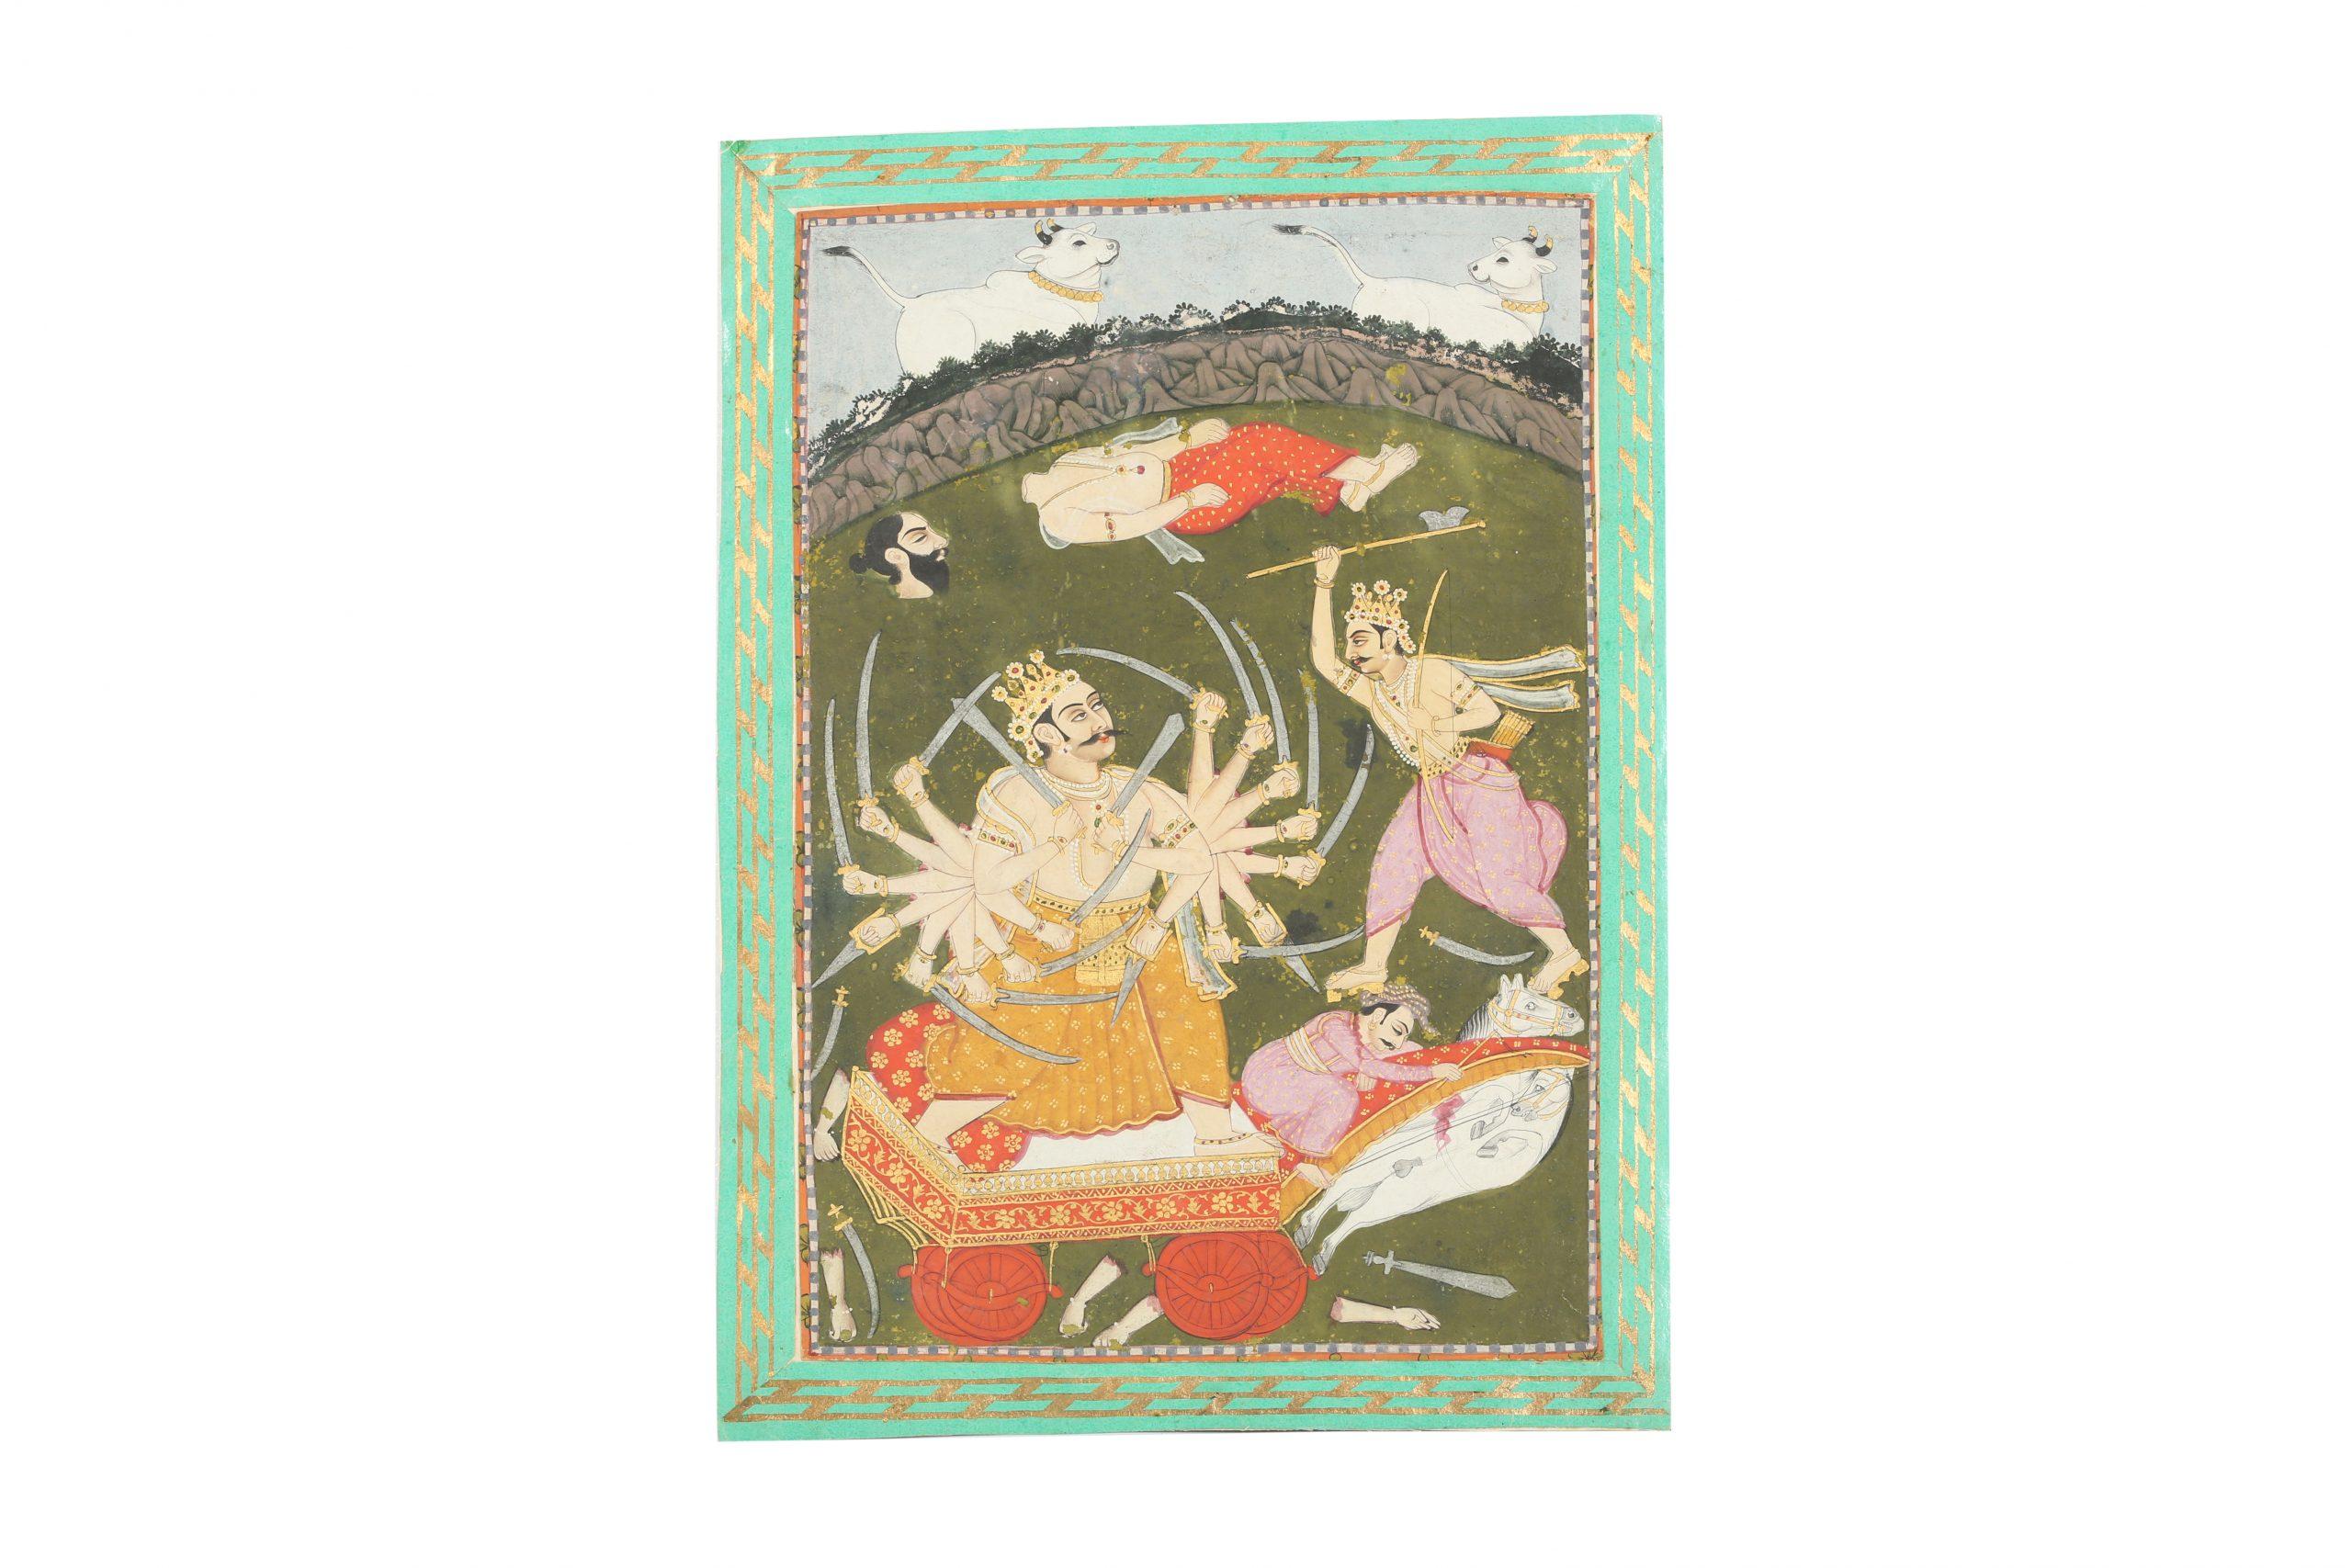 An illustration from a Bhagavata Purana series: Parashurama in combat with Kartavirya Arjuna. Bikaner, Rajasthan, North-Western India, circa 1780- 1820. Estimate £800 - £1,200